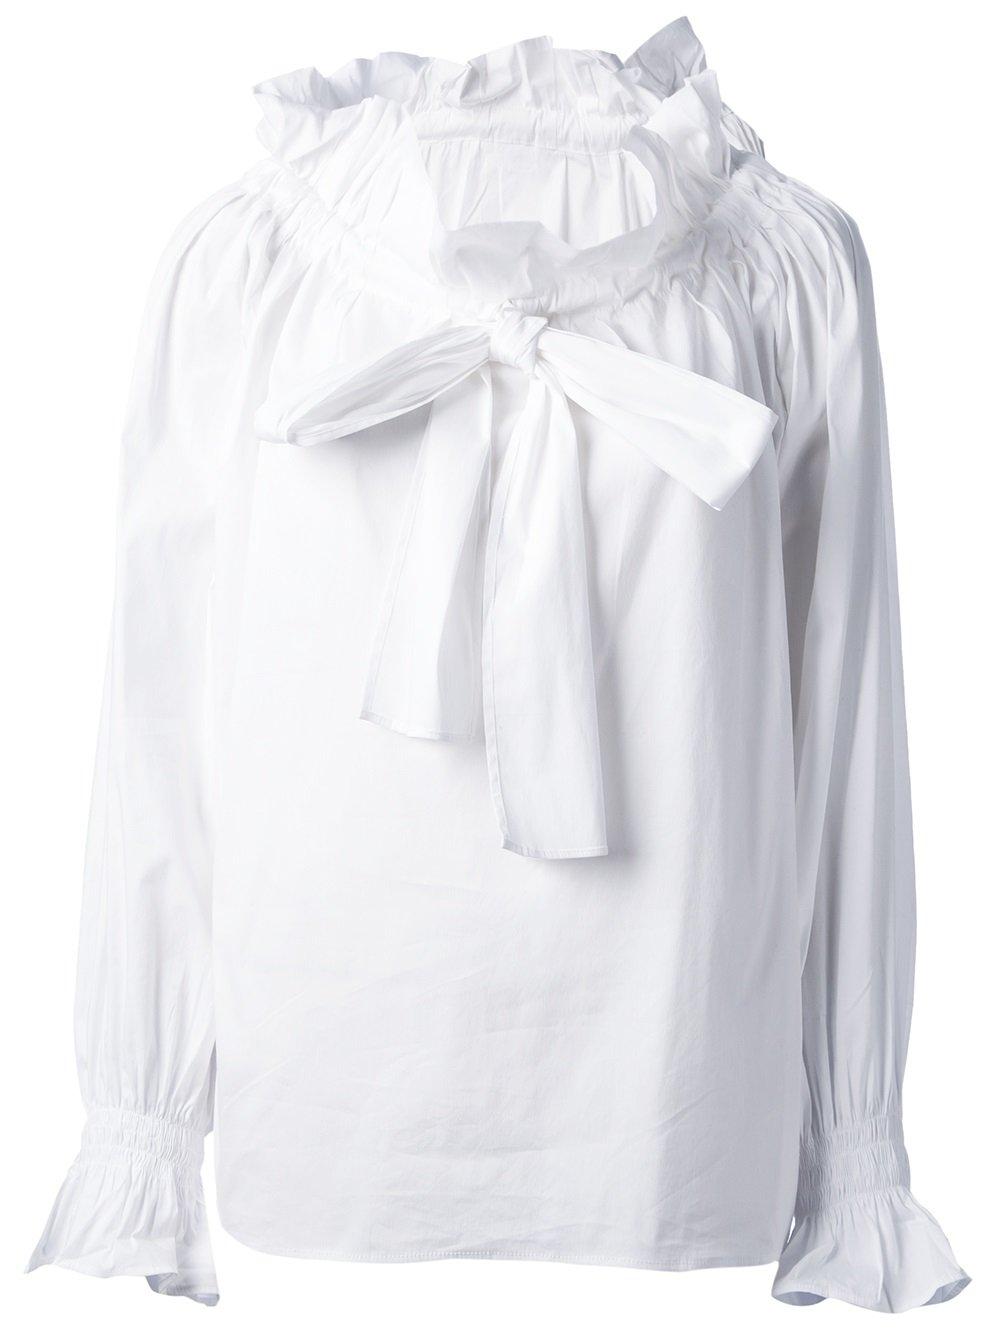 a8b41c434b69d Source · Lyst Tsumori Chisato Ruffle Neck Blouse in White